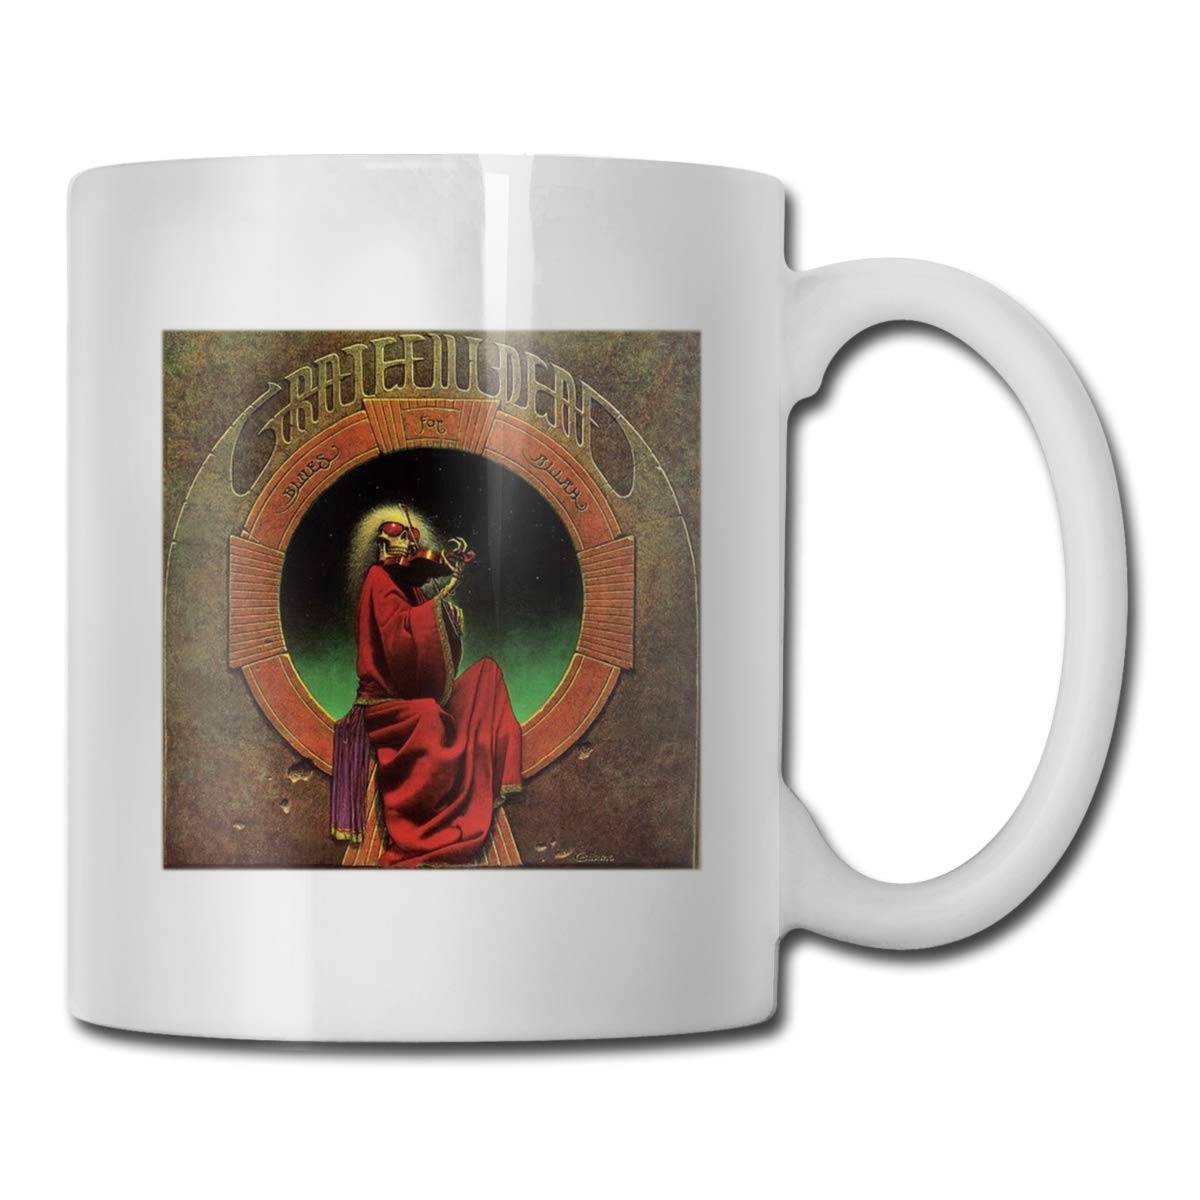 Office Coffee Cup GratefulDealblueeesforAllah Geblackus 14.72 OZ Capacity Mug is Perfect for CoffeeWhite